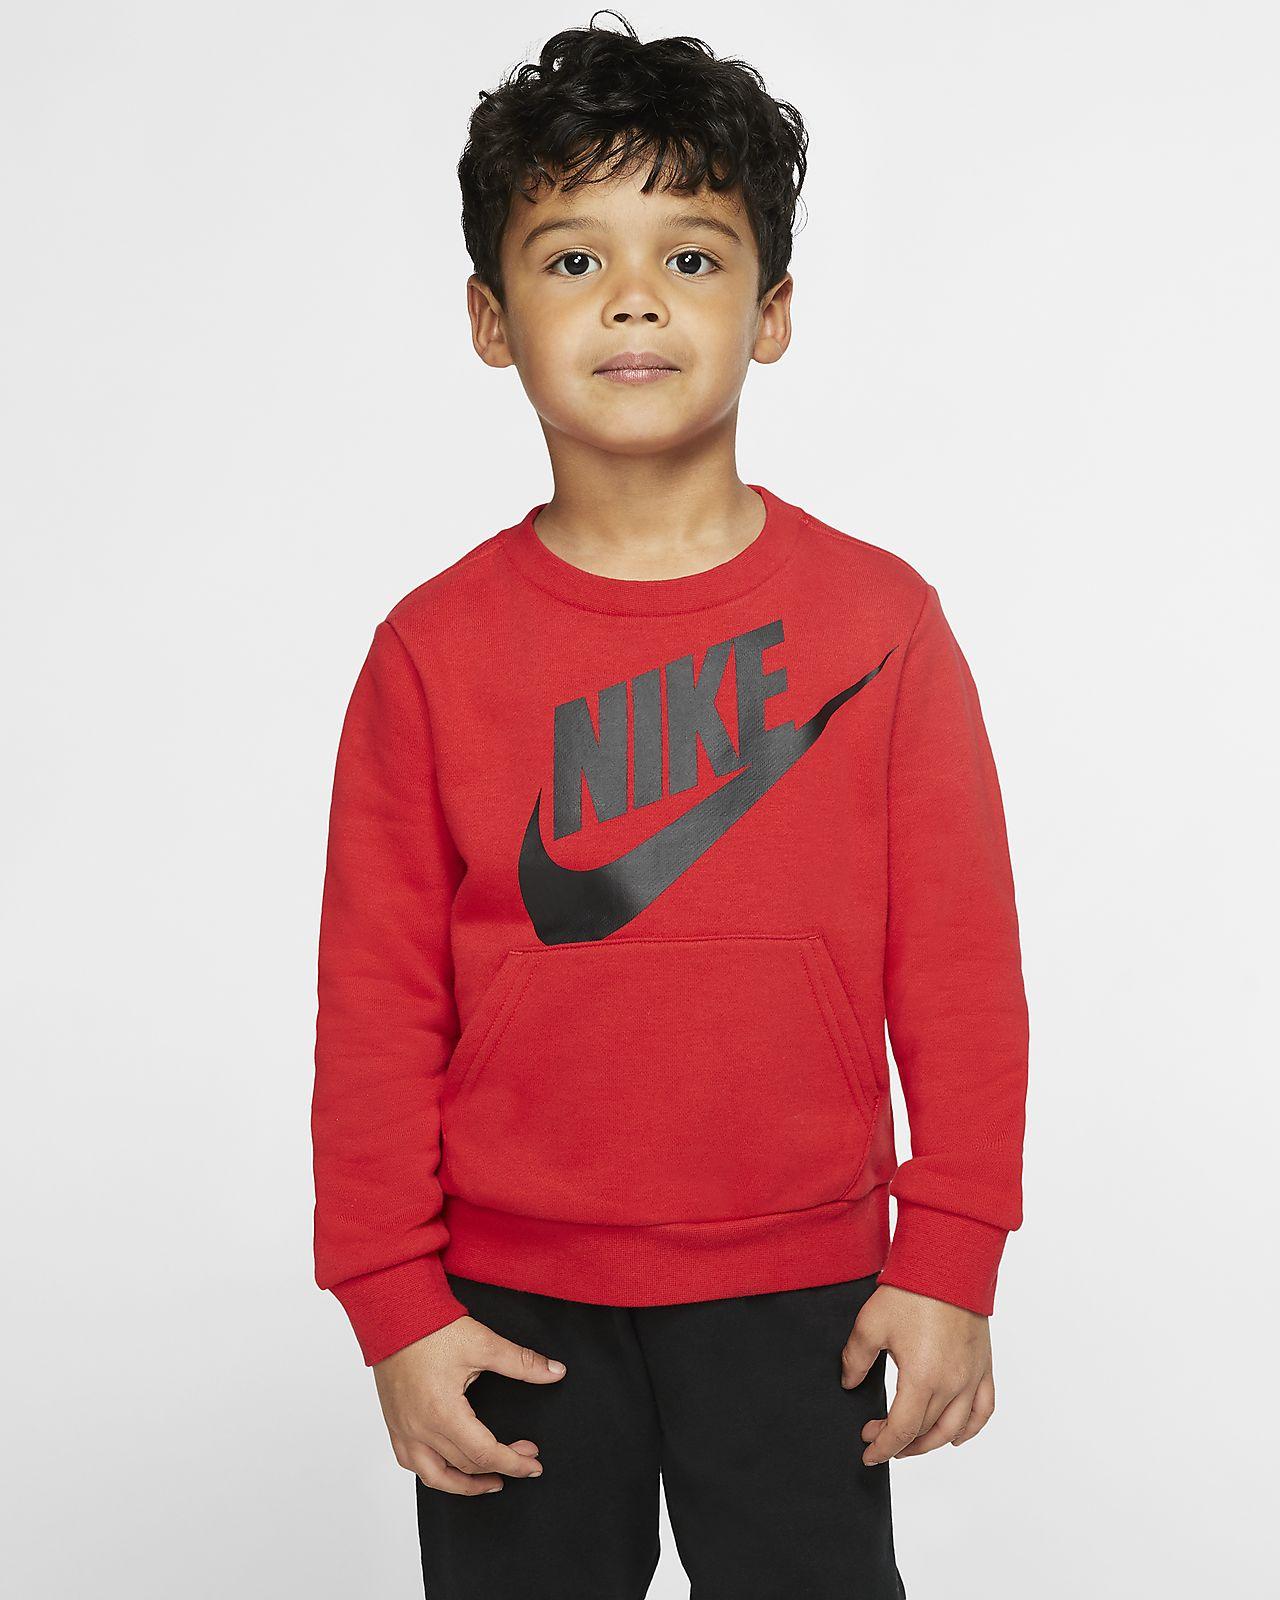 Nike 婴童套头圆领上衣